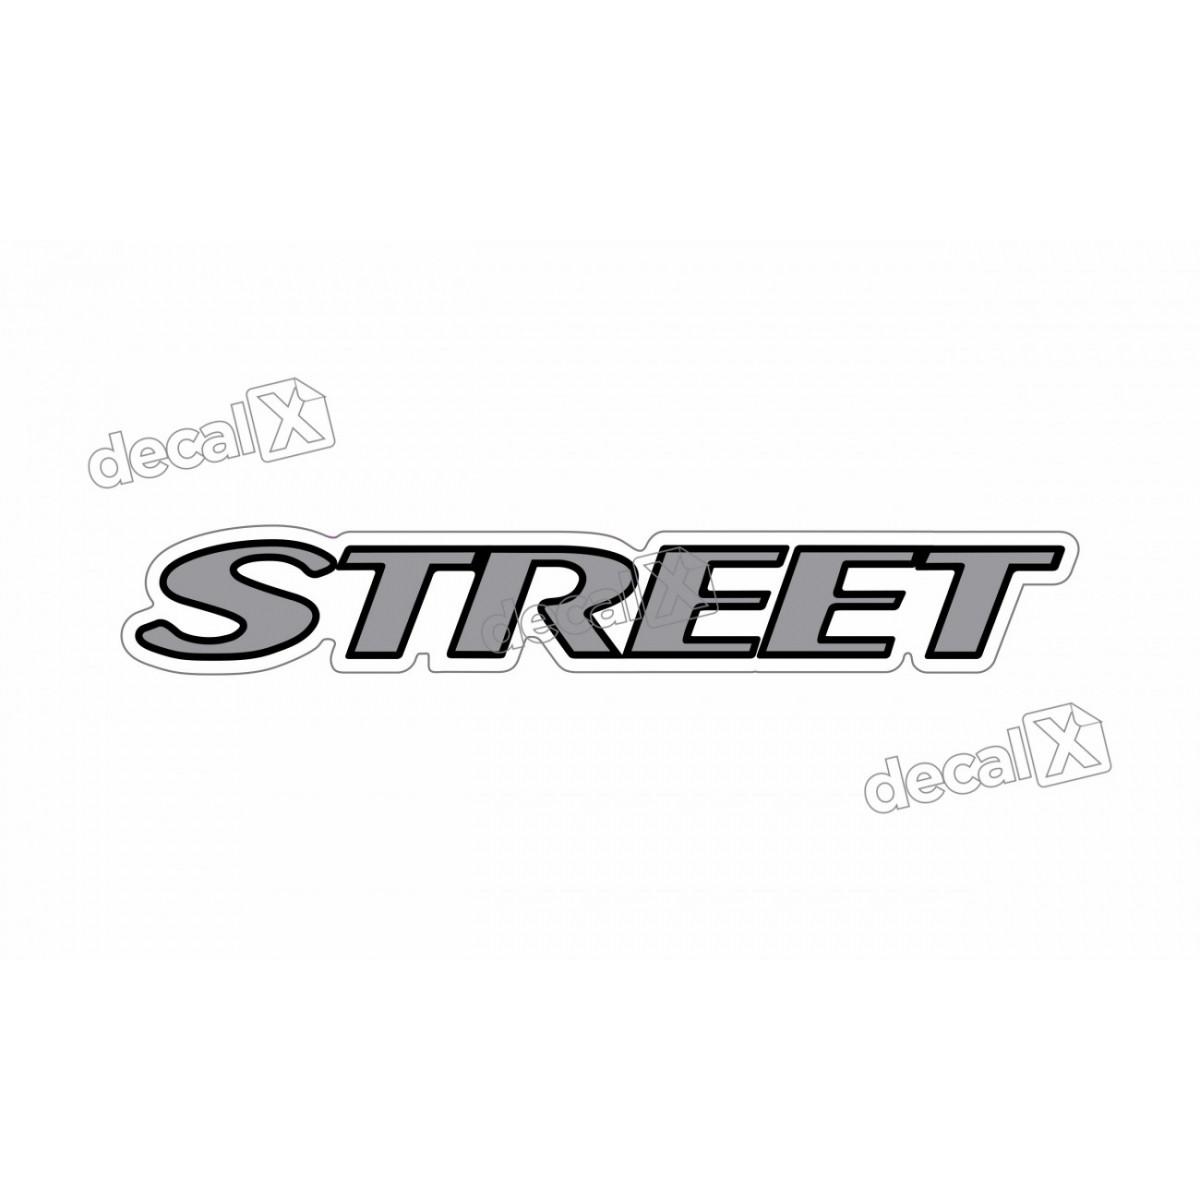 Adesivo Emblema Resinado Mercedes Street Cm102 Decalx